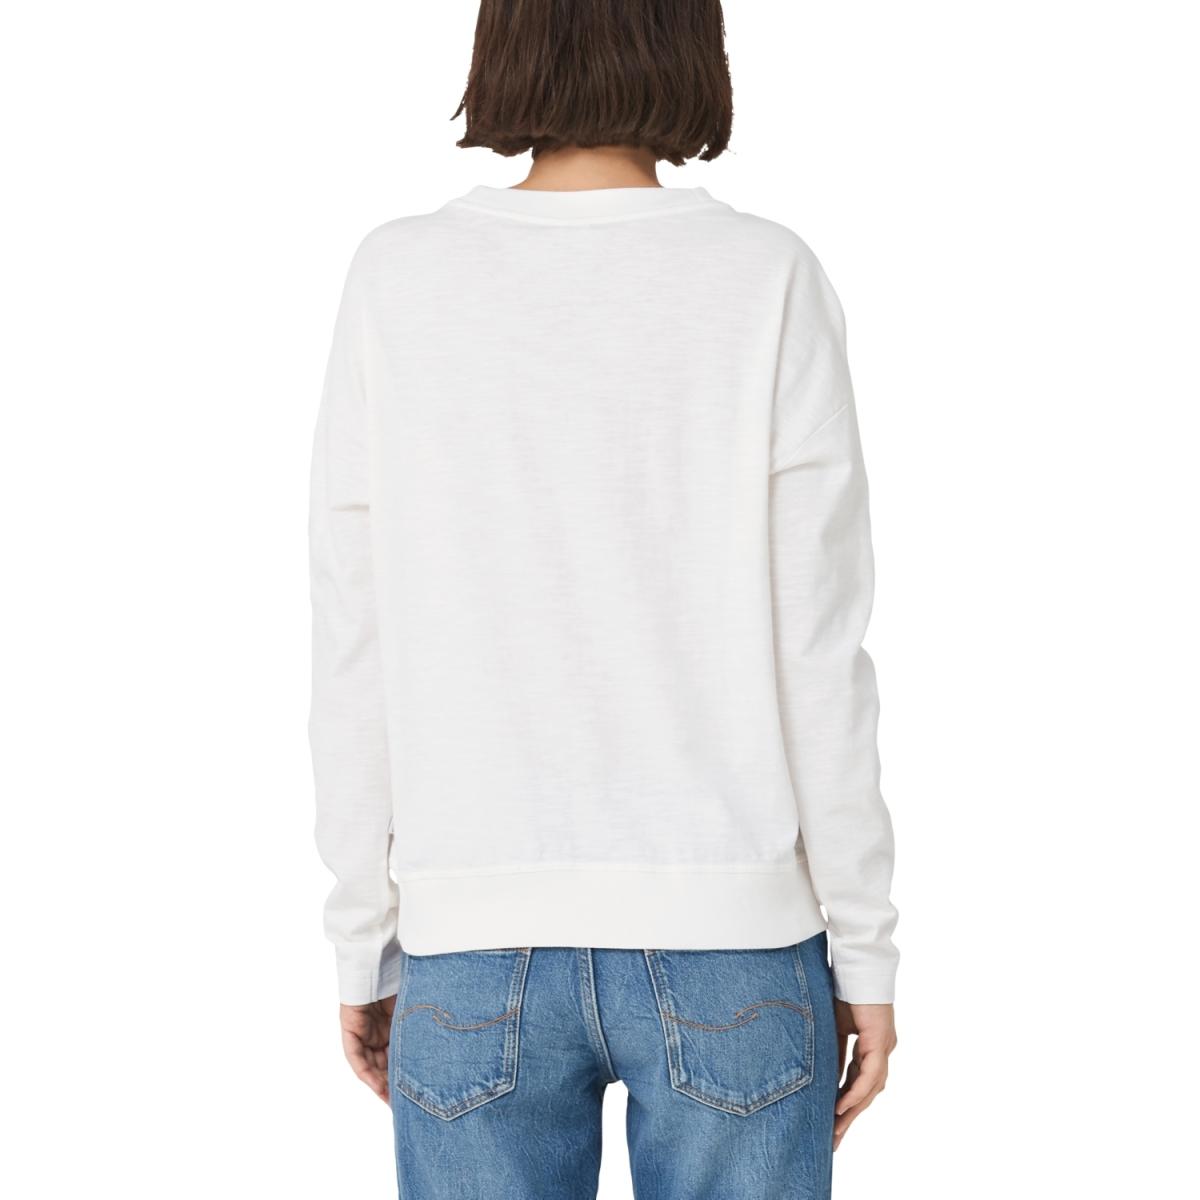 longsleeve 41909313142 q/s designed by t-shirt 02d0